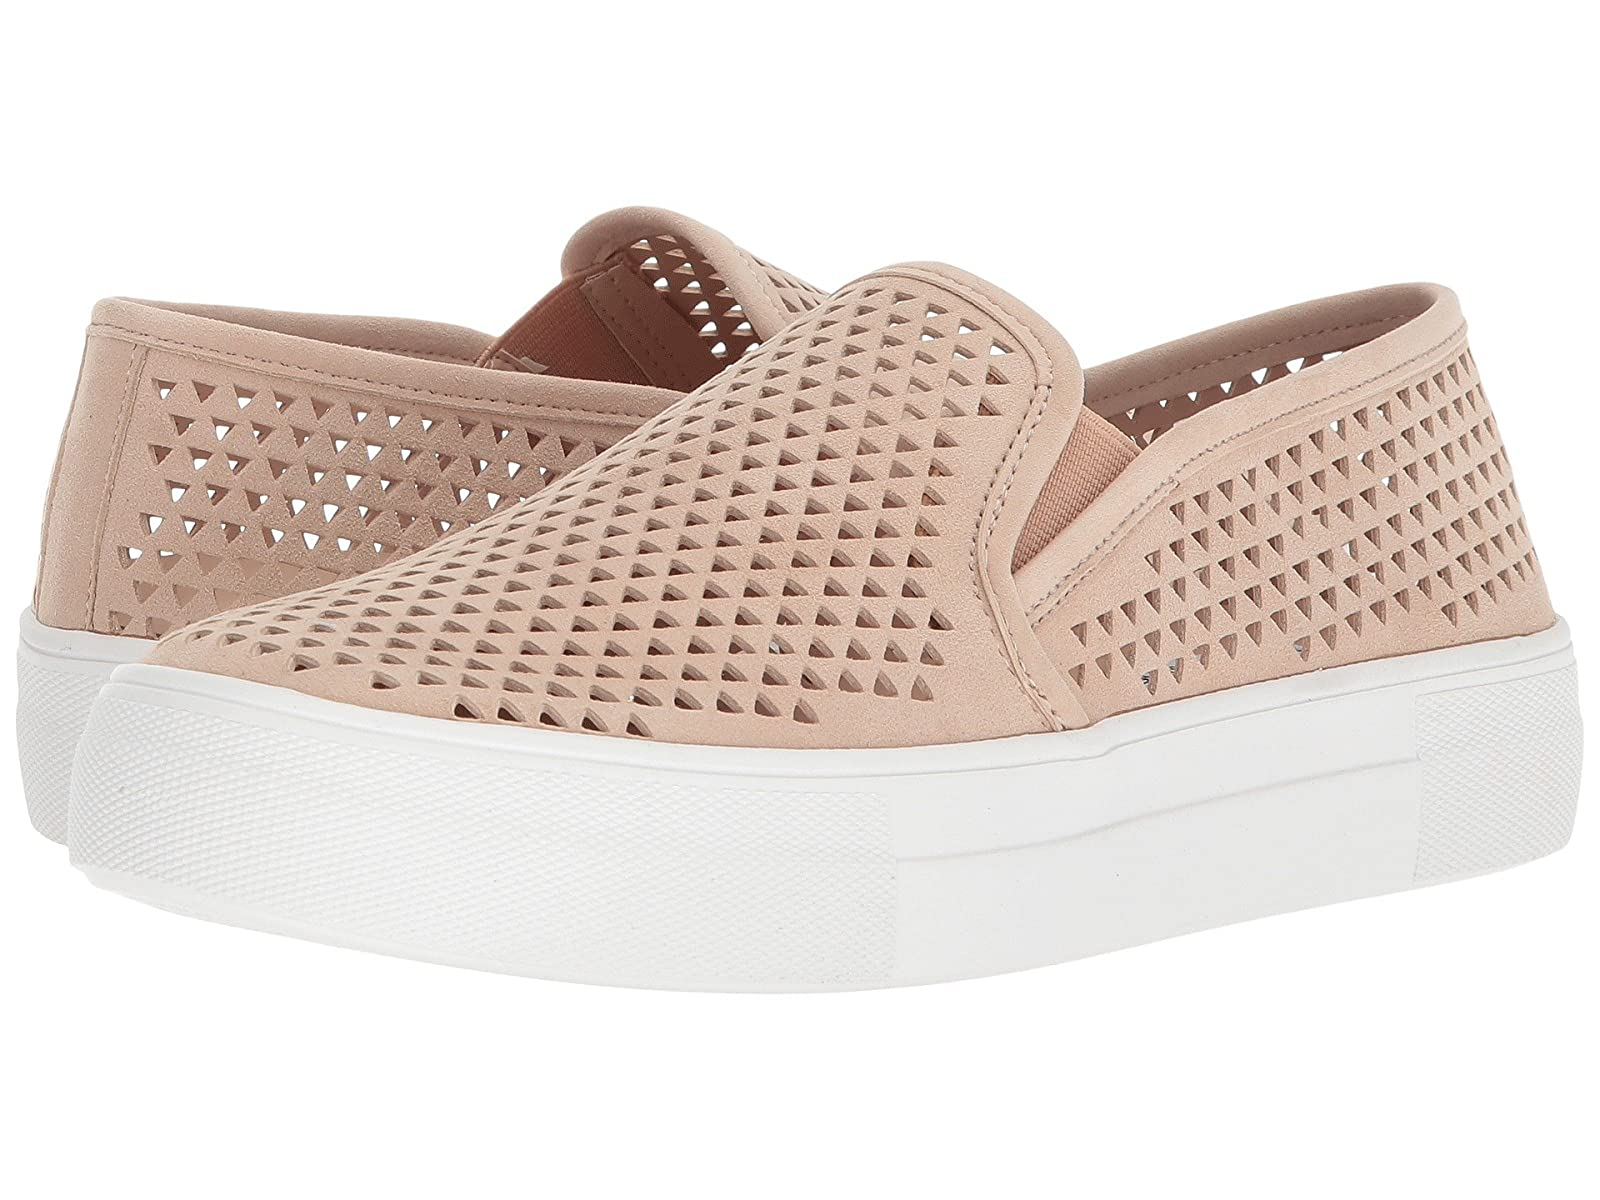 Steve Madden Gills-P SneakerAtmospheric grades have affordable shoes